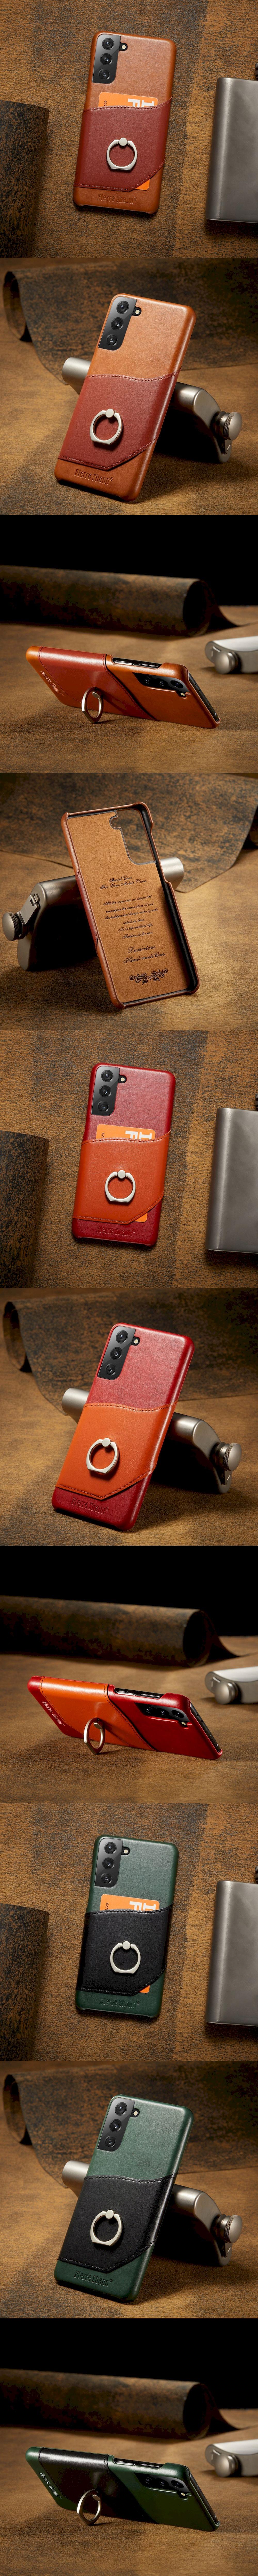 640-Samsung-牛皮真皮跳色插卡造型支架(S21)